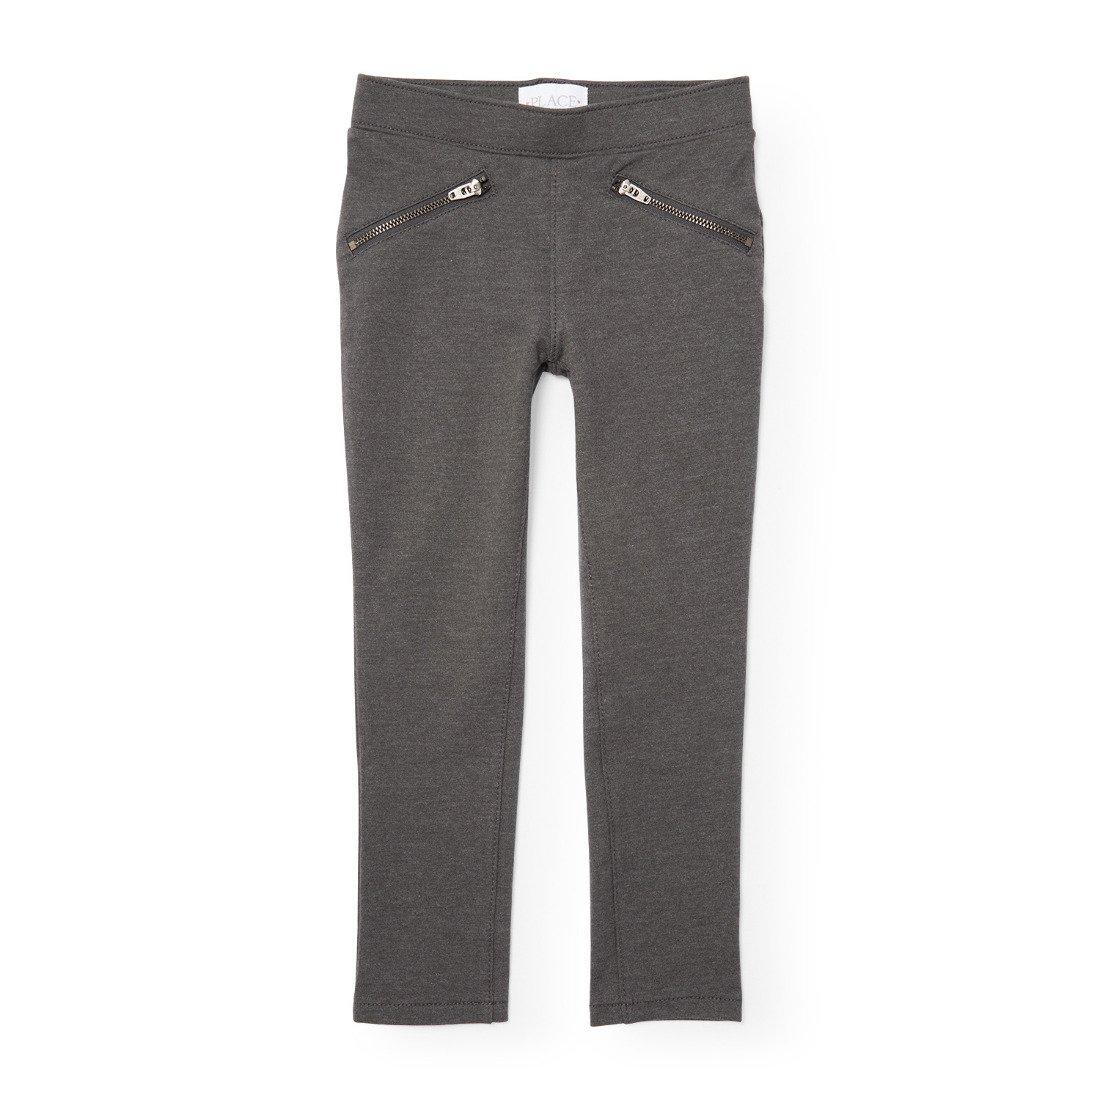 The Children's Place Girls' Stretch Zipper Ponte Pant